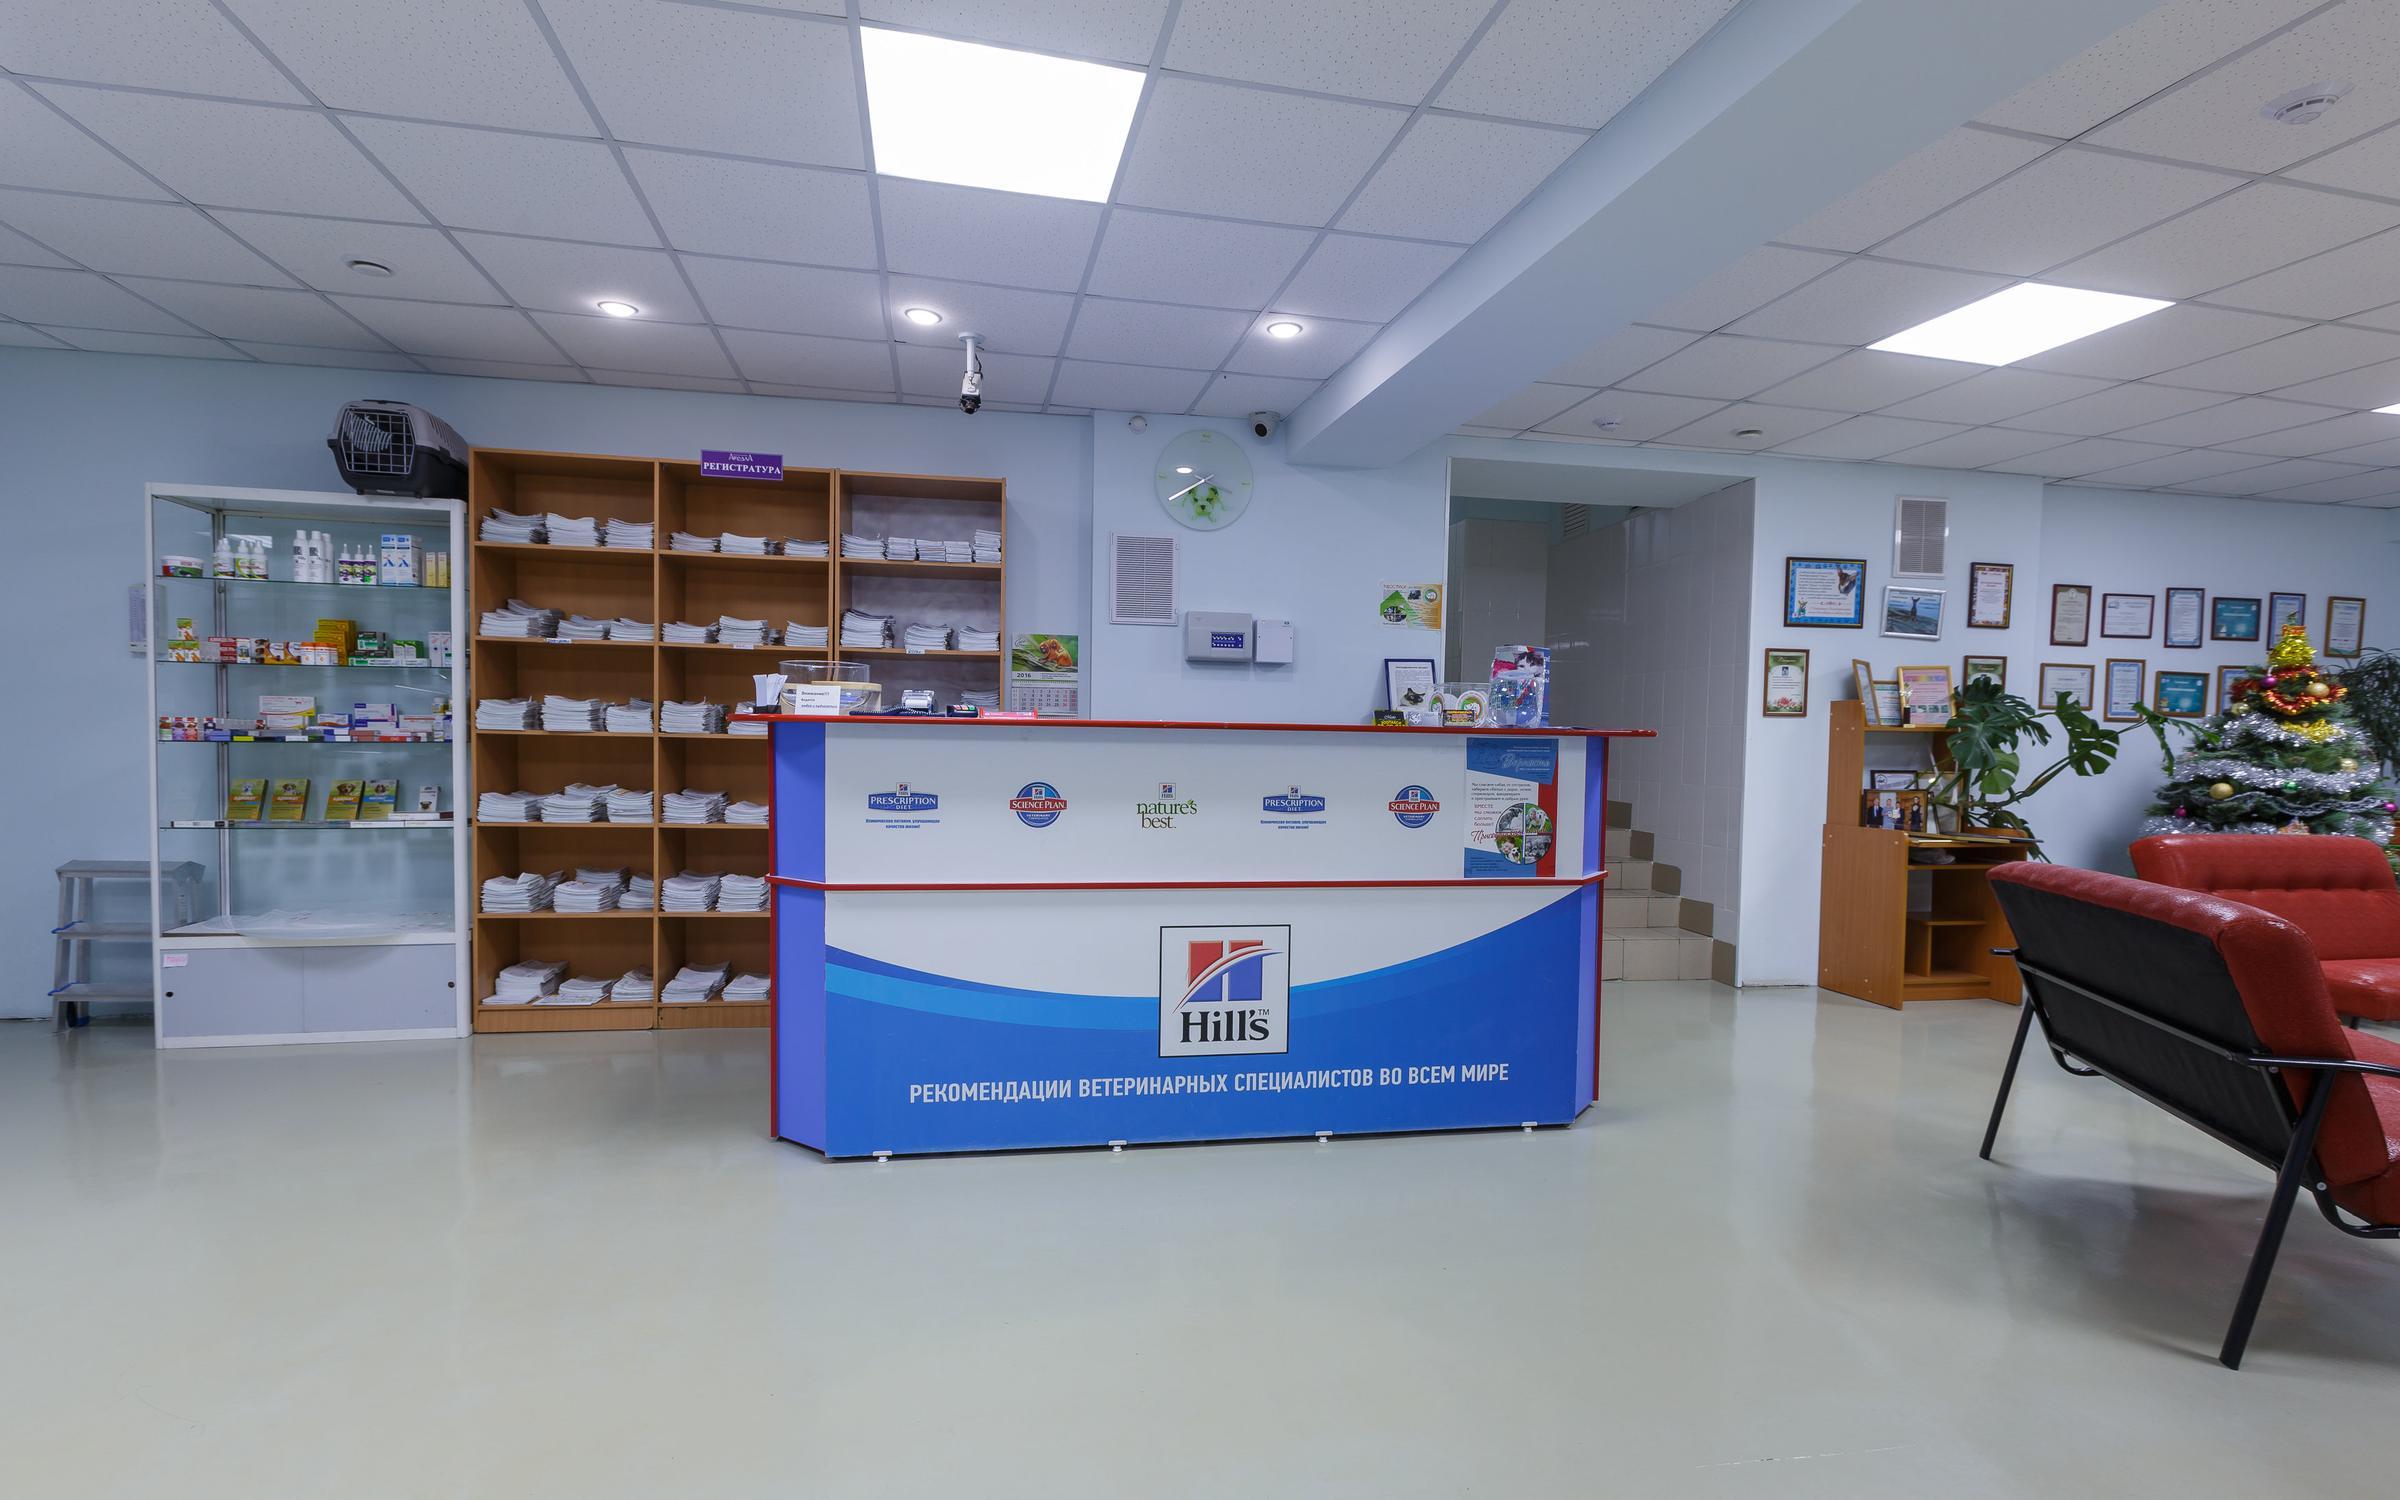 фотография Ветеринарной клиники Акелла на улице Партизана Железняка